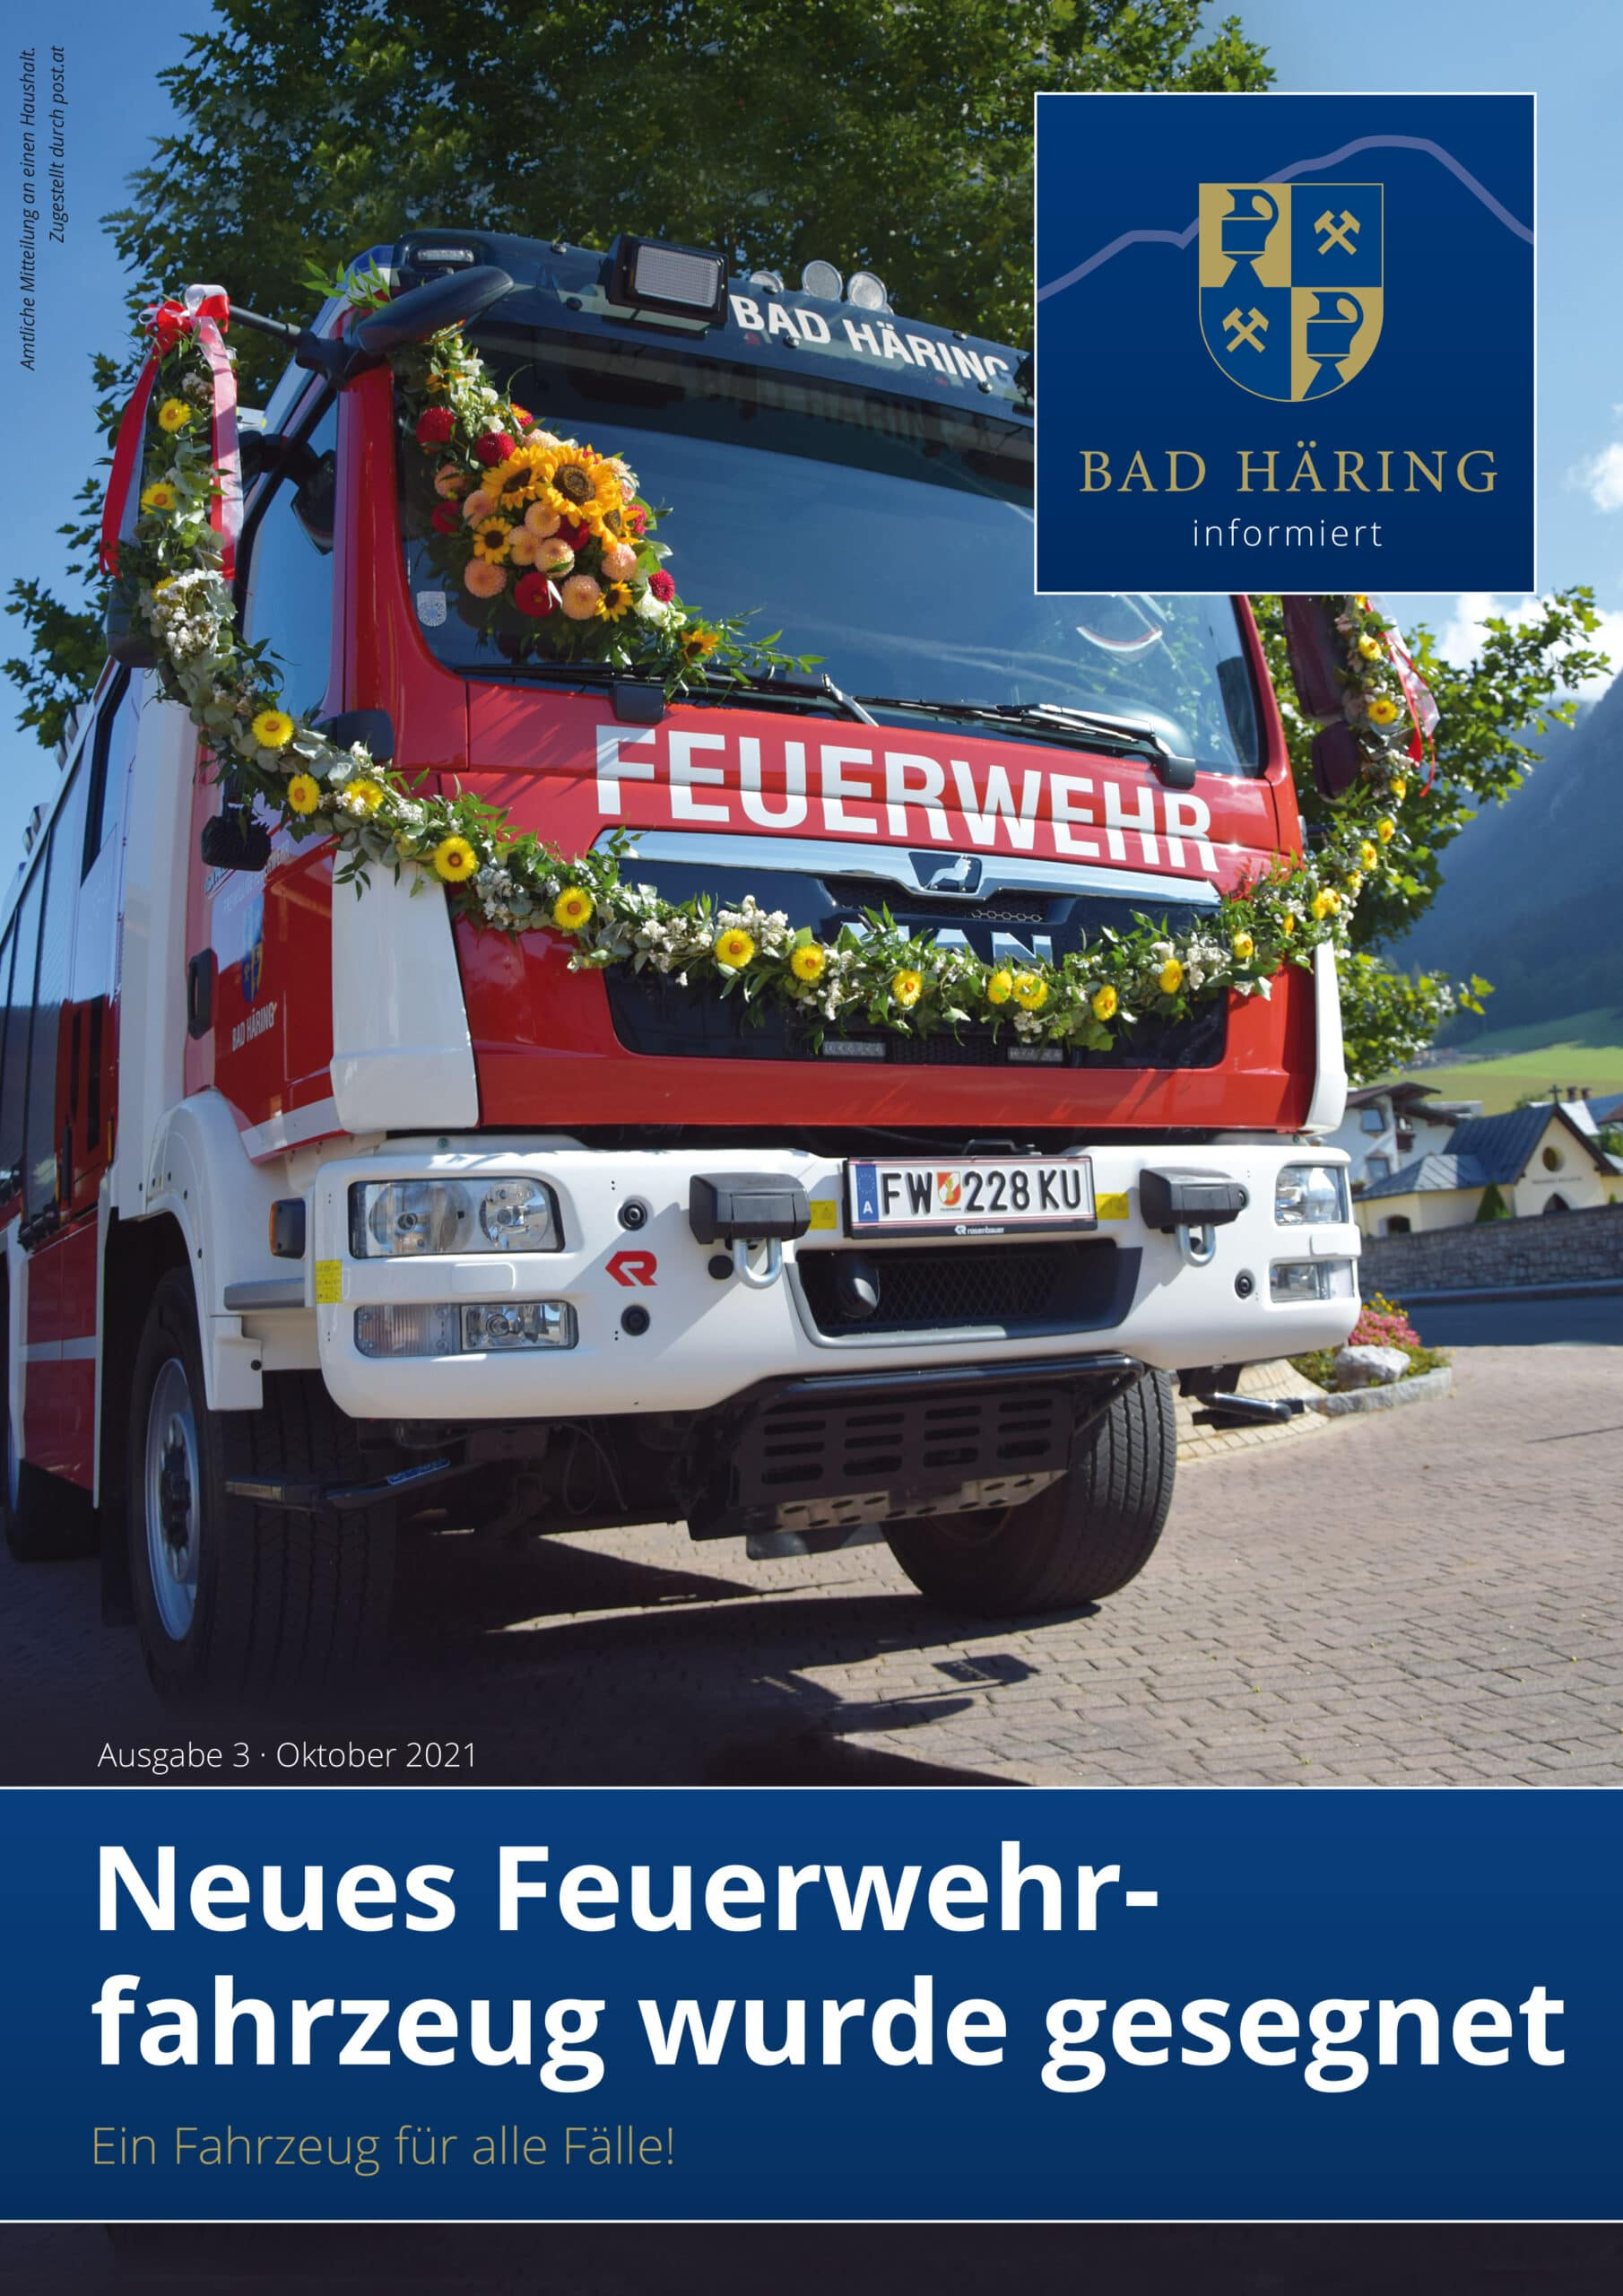 @Gemeinde Bad Häring